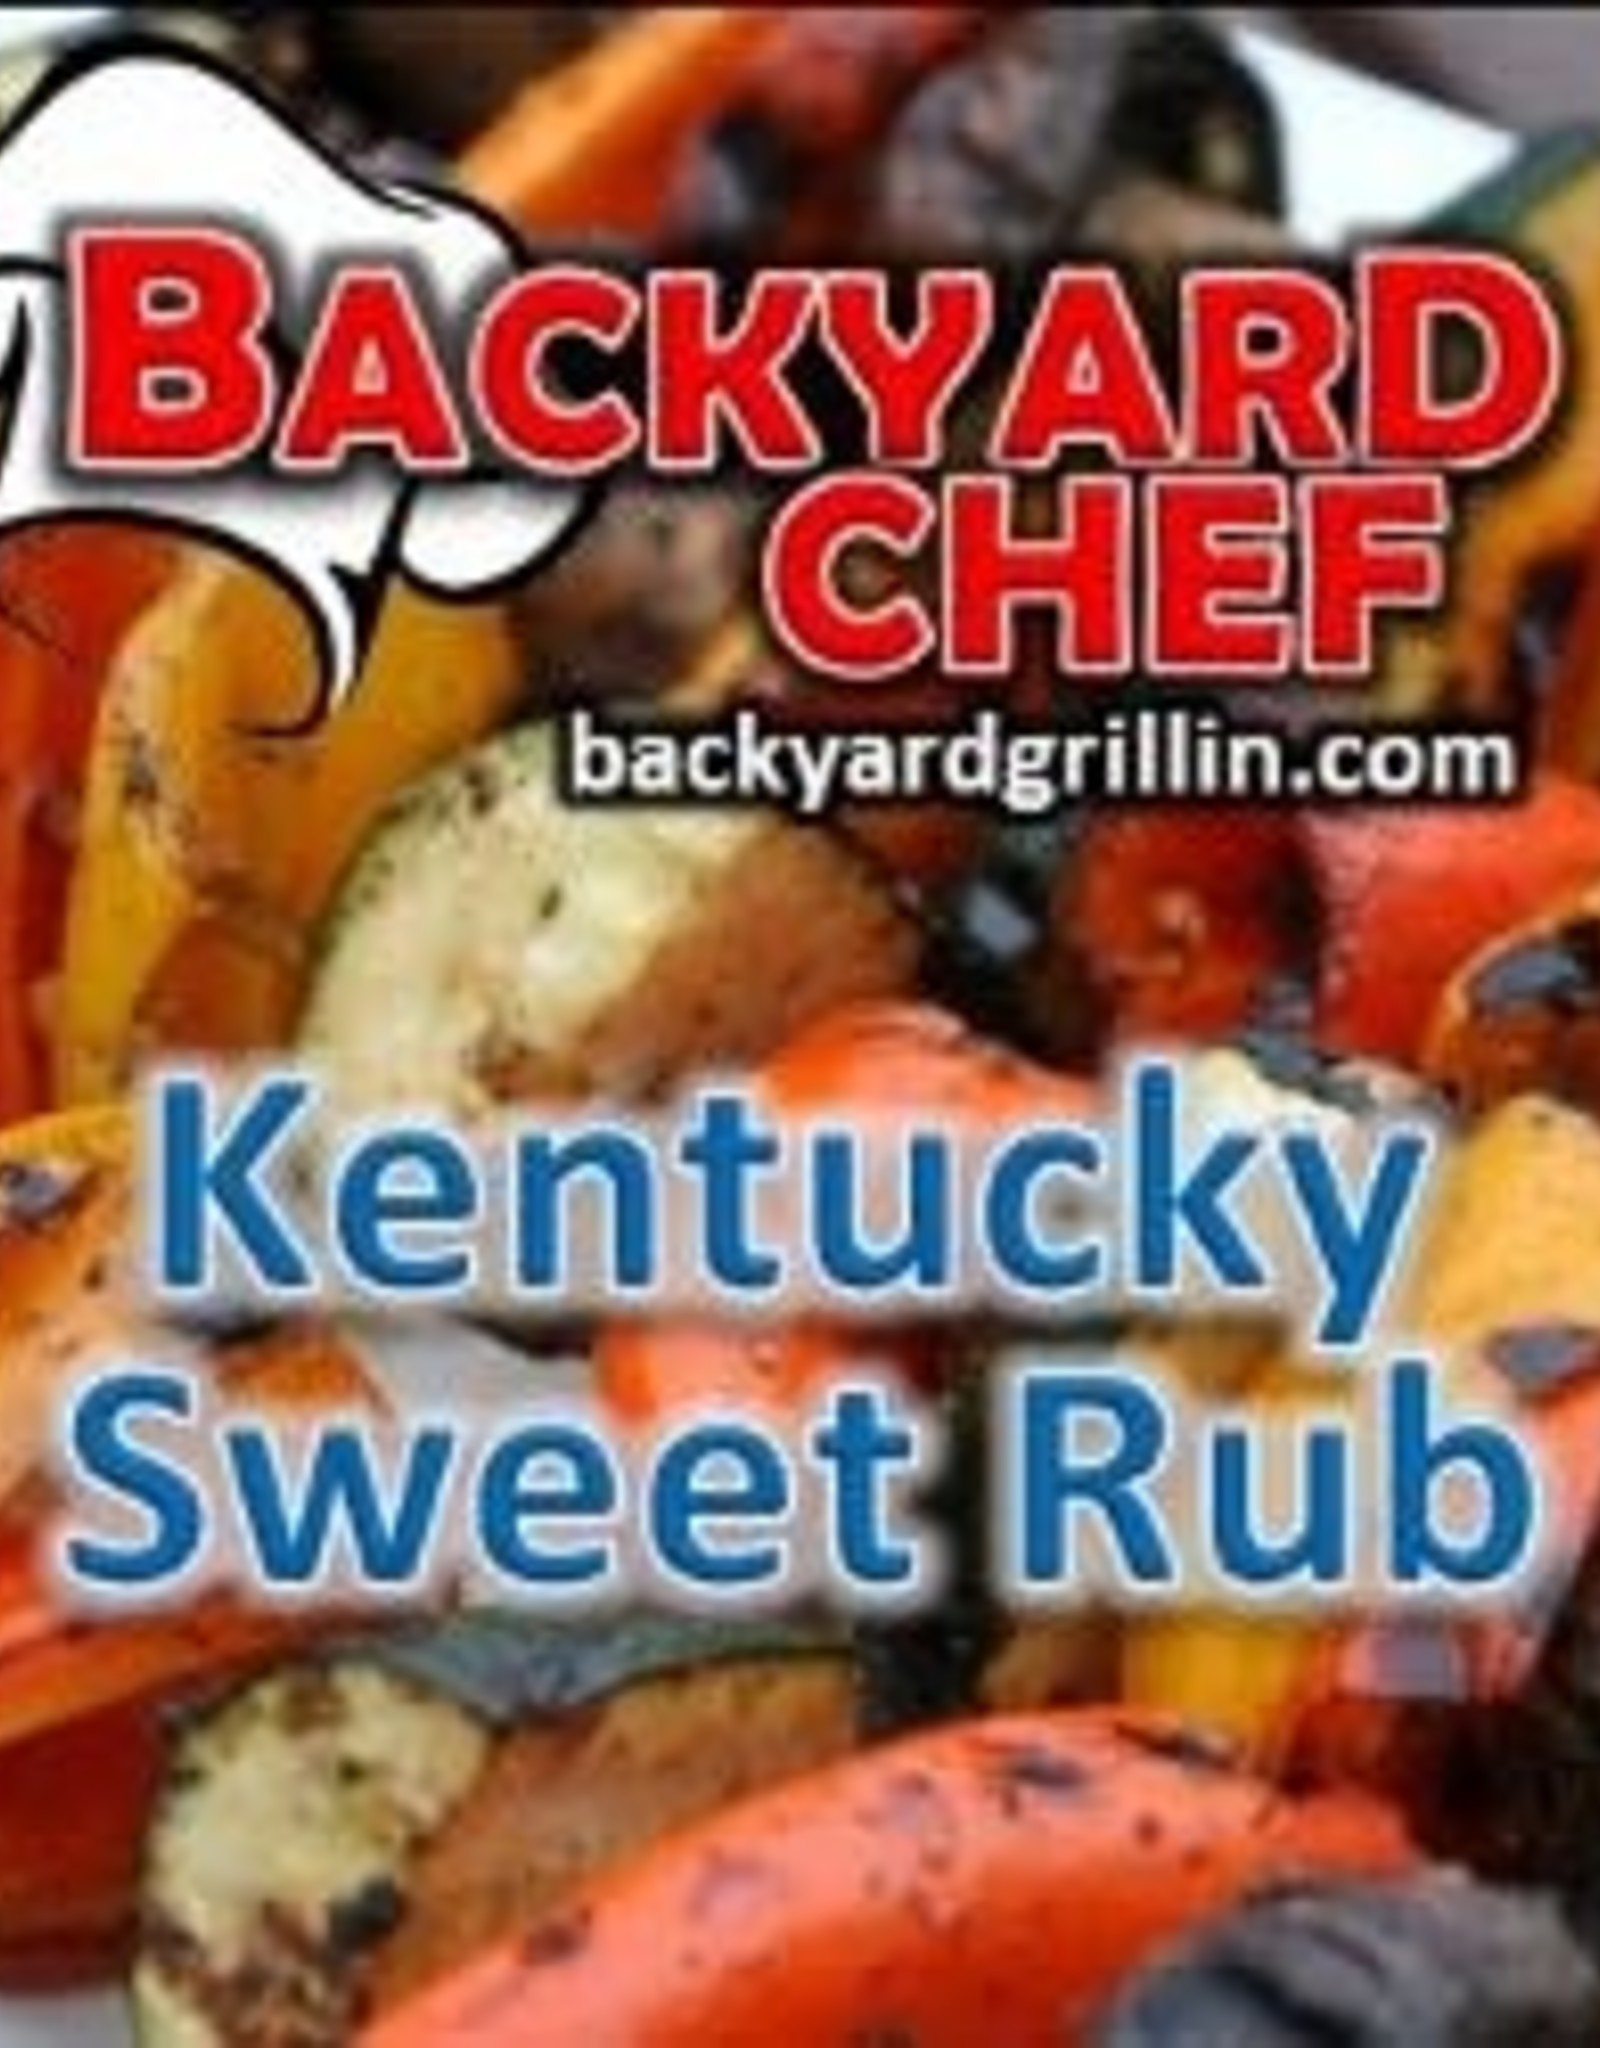 Backyard Chef Kentucky Sweet Rub - 13 oz.